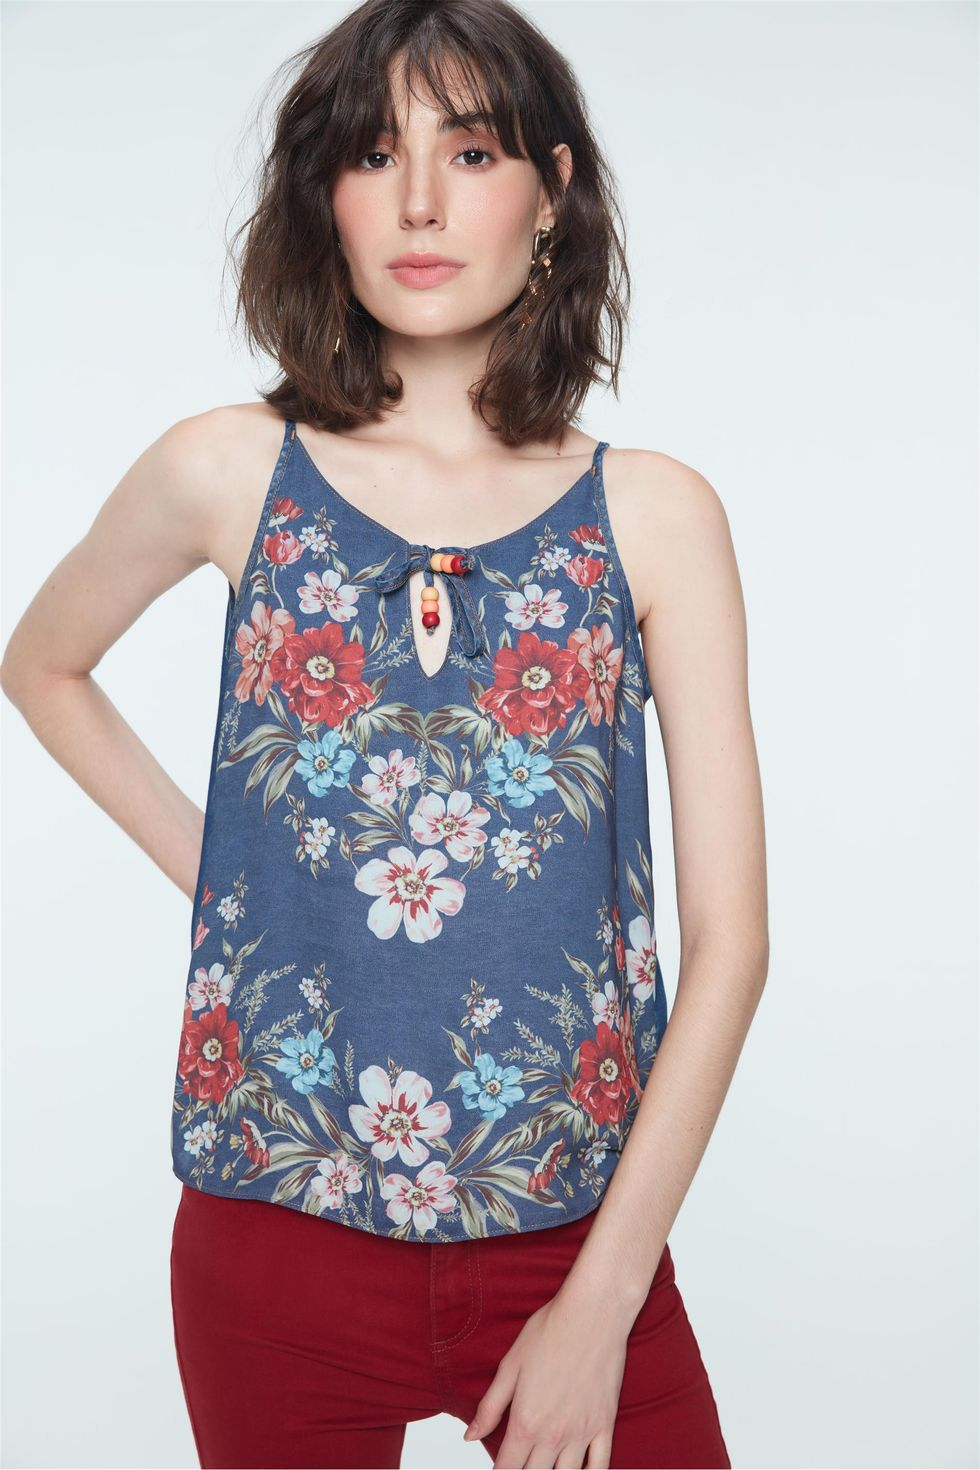 Regata-Jeans-com-Estampa-Floral-Frente--